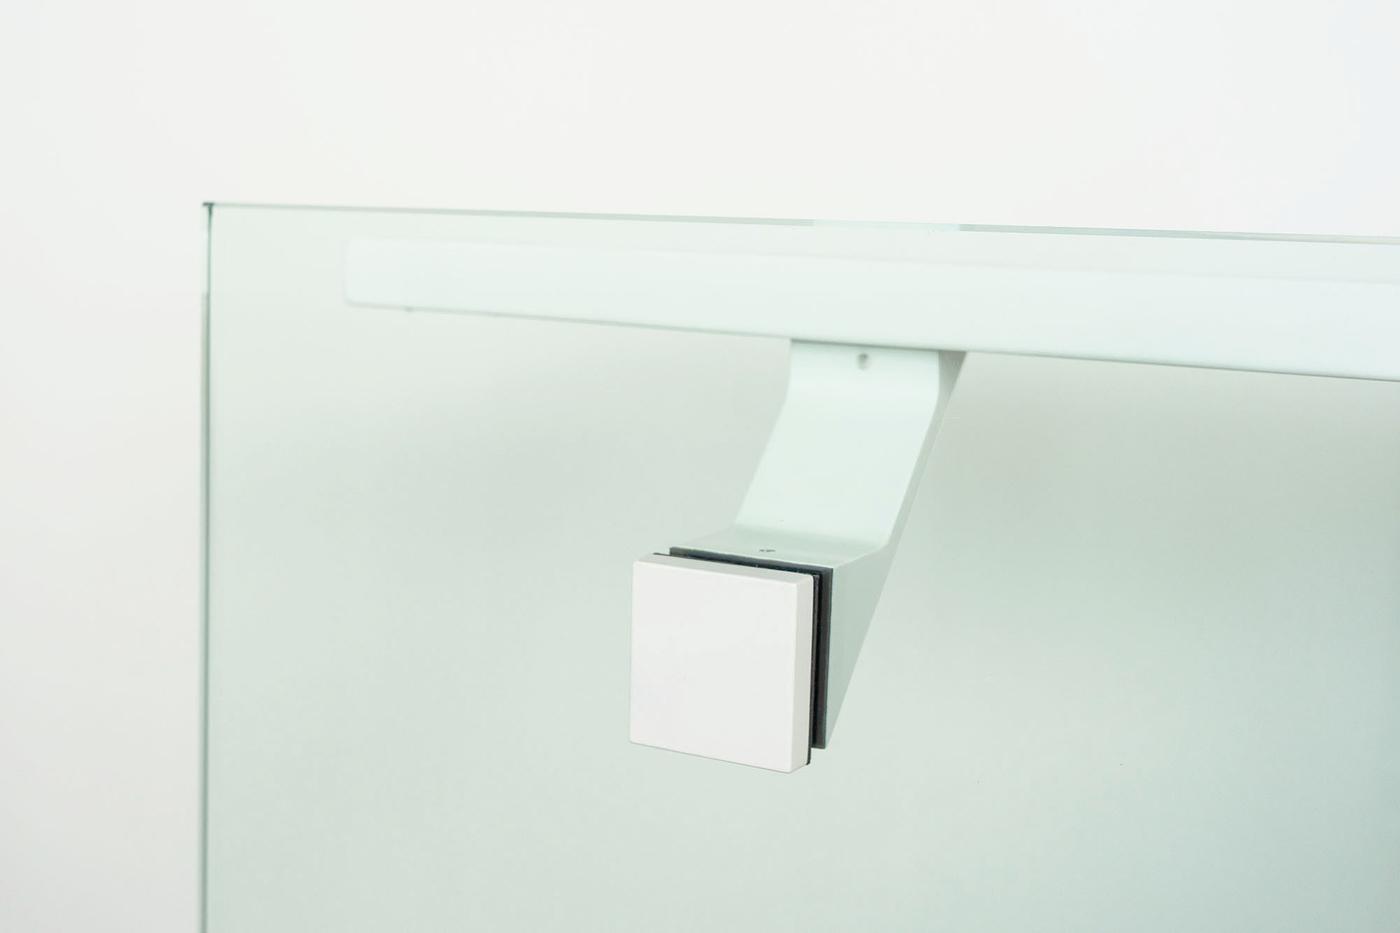 White-glass-mounted-handrail-bracket